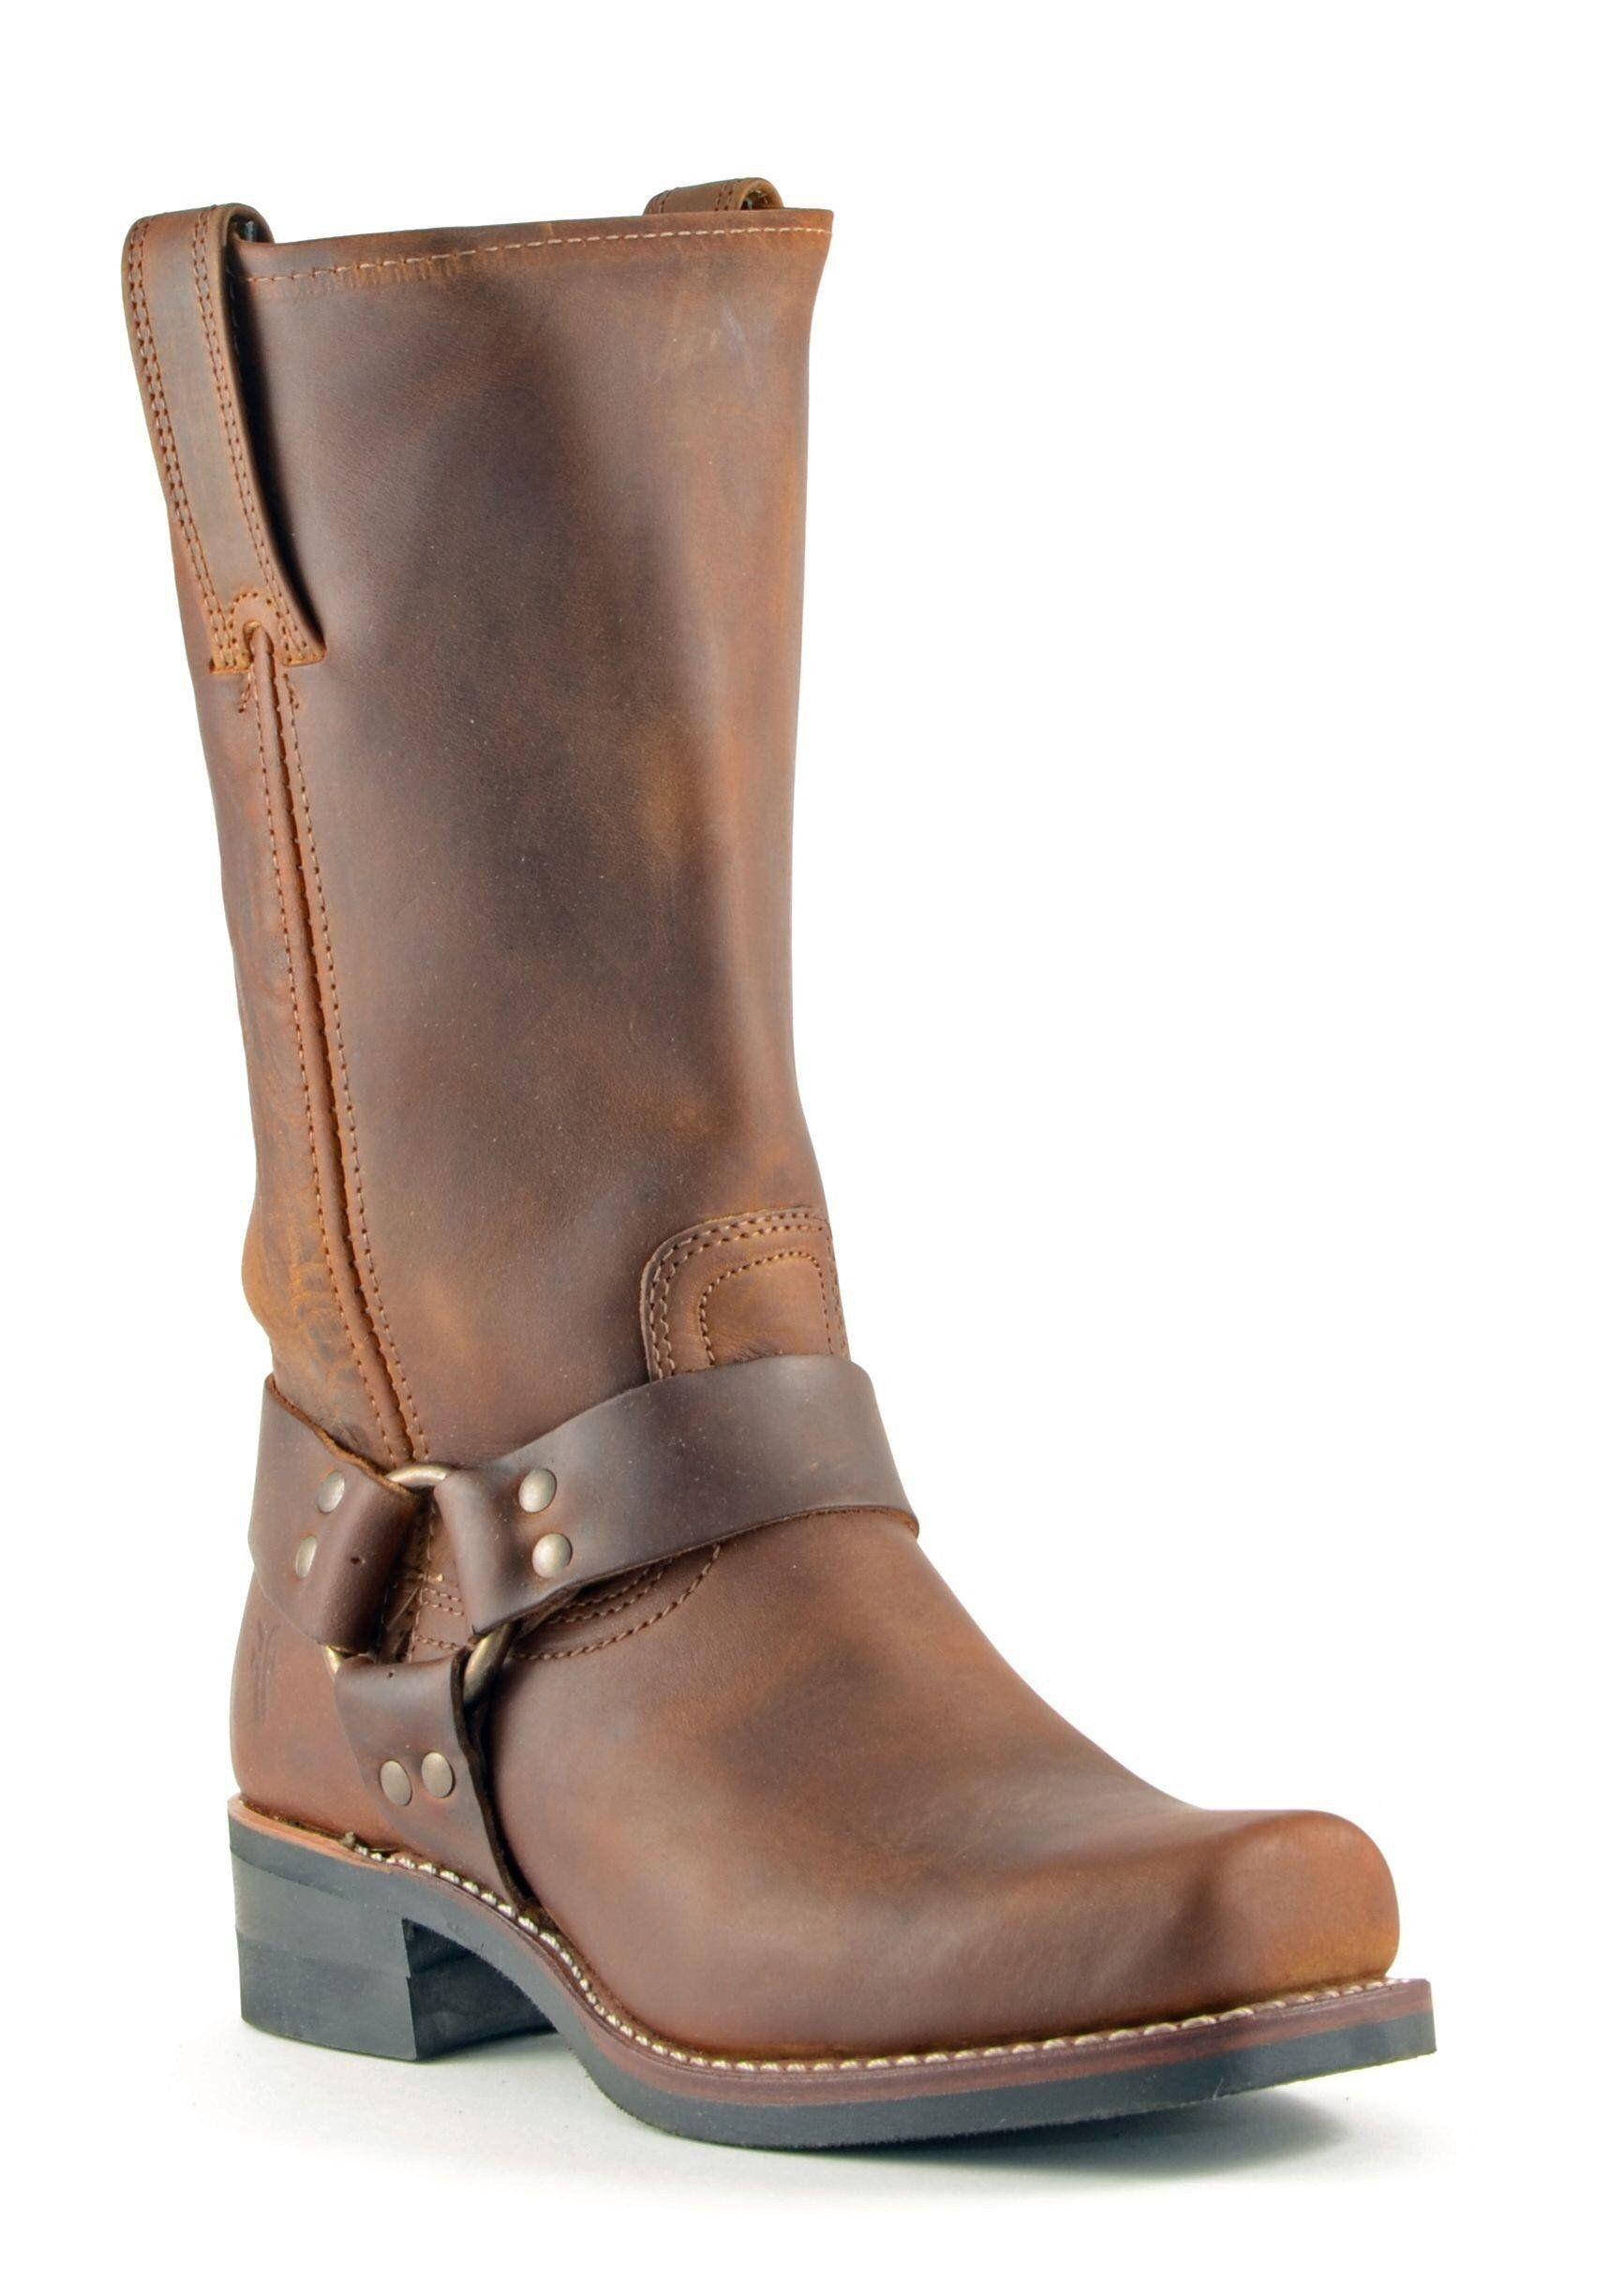 Frye 12R Harness Boot | Custom cowboy boots, Frye boots mens